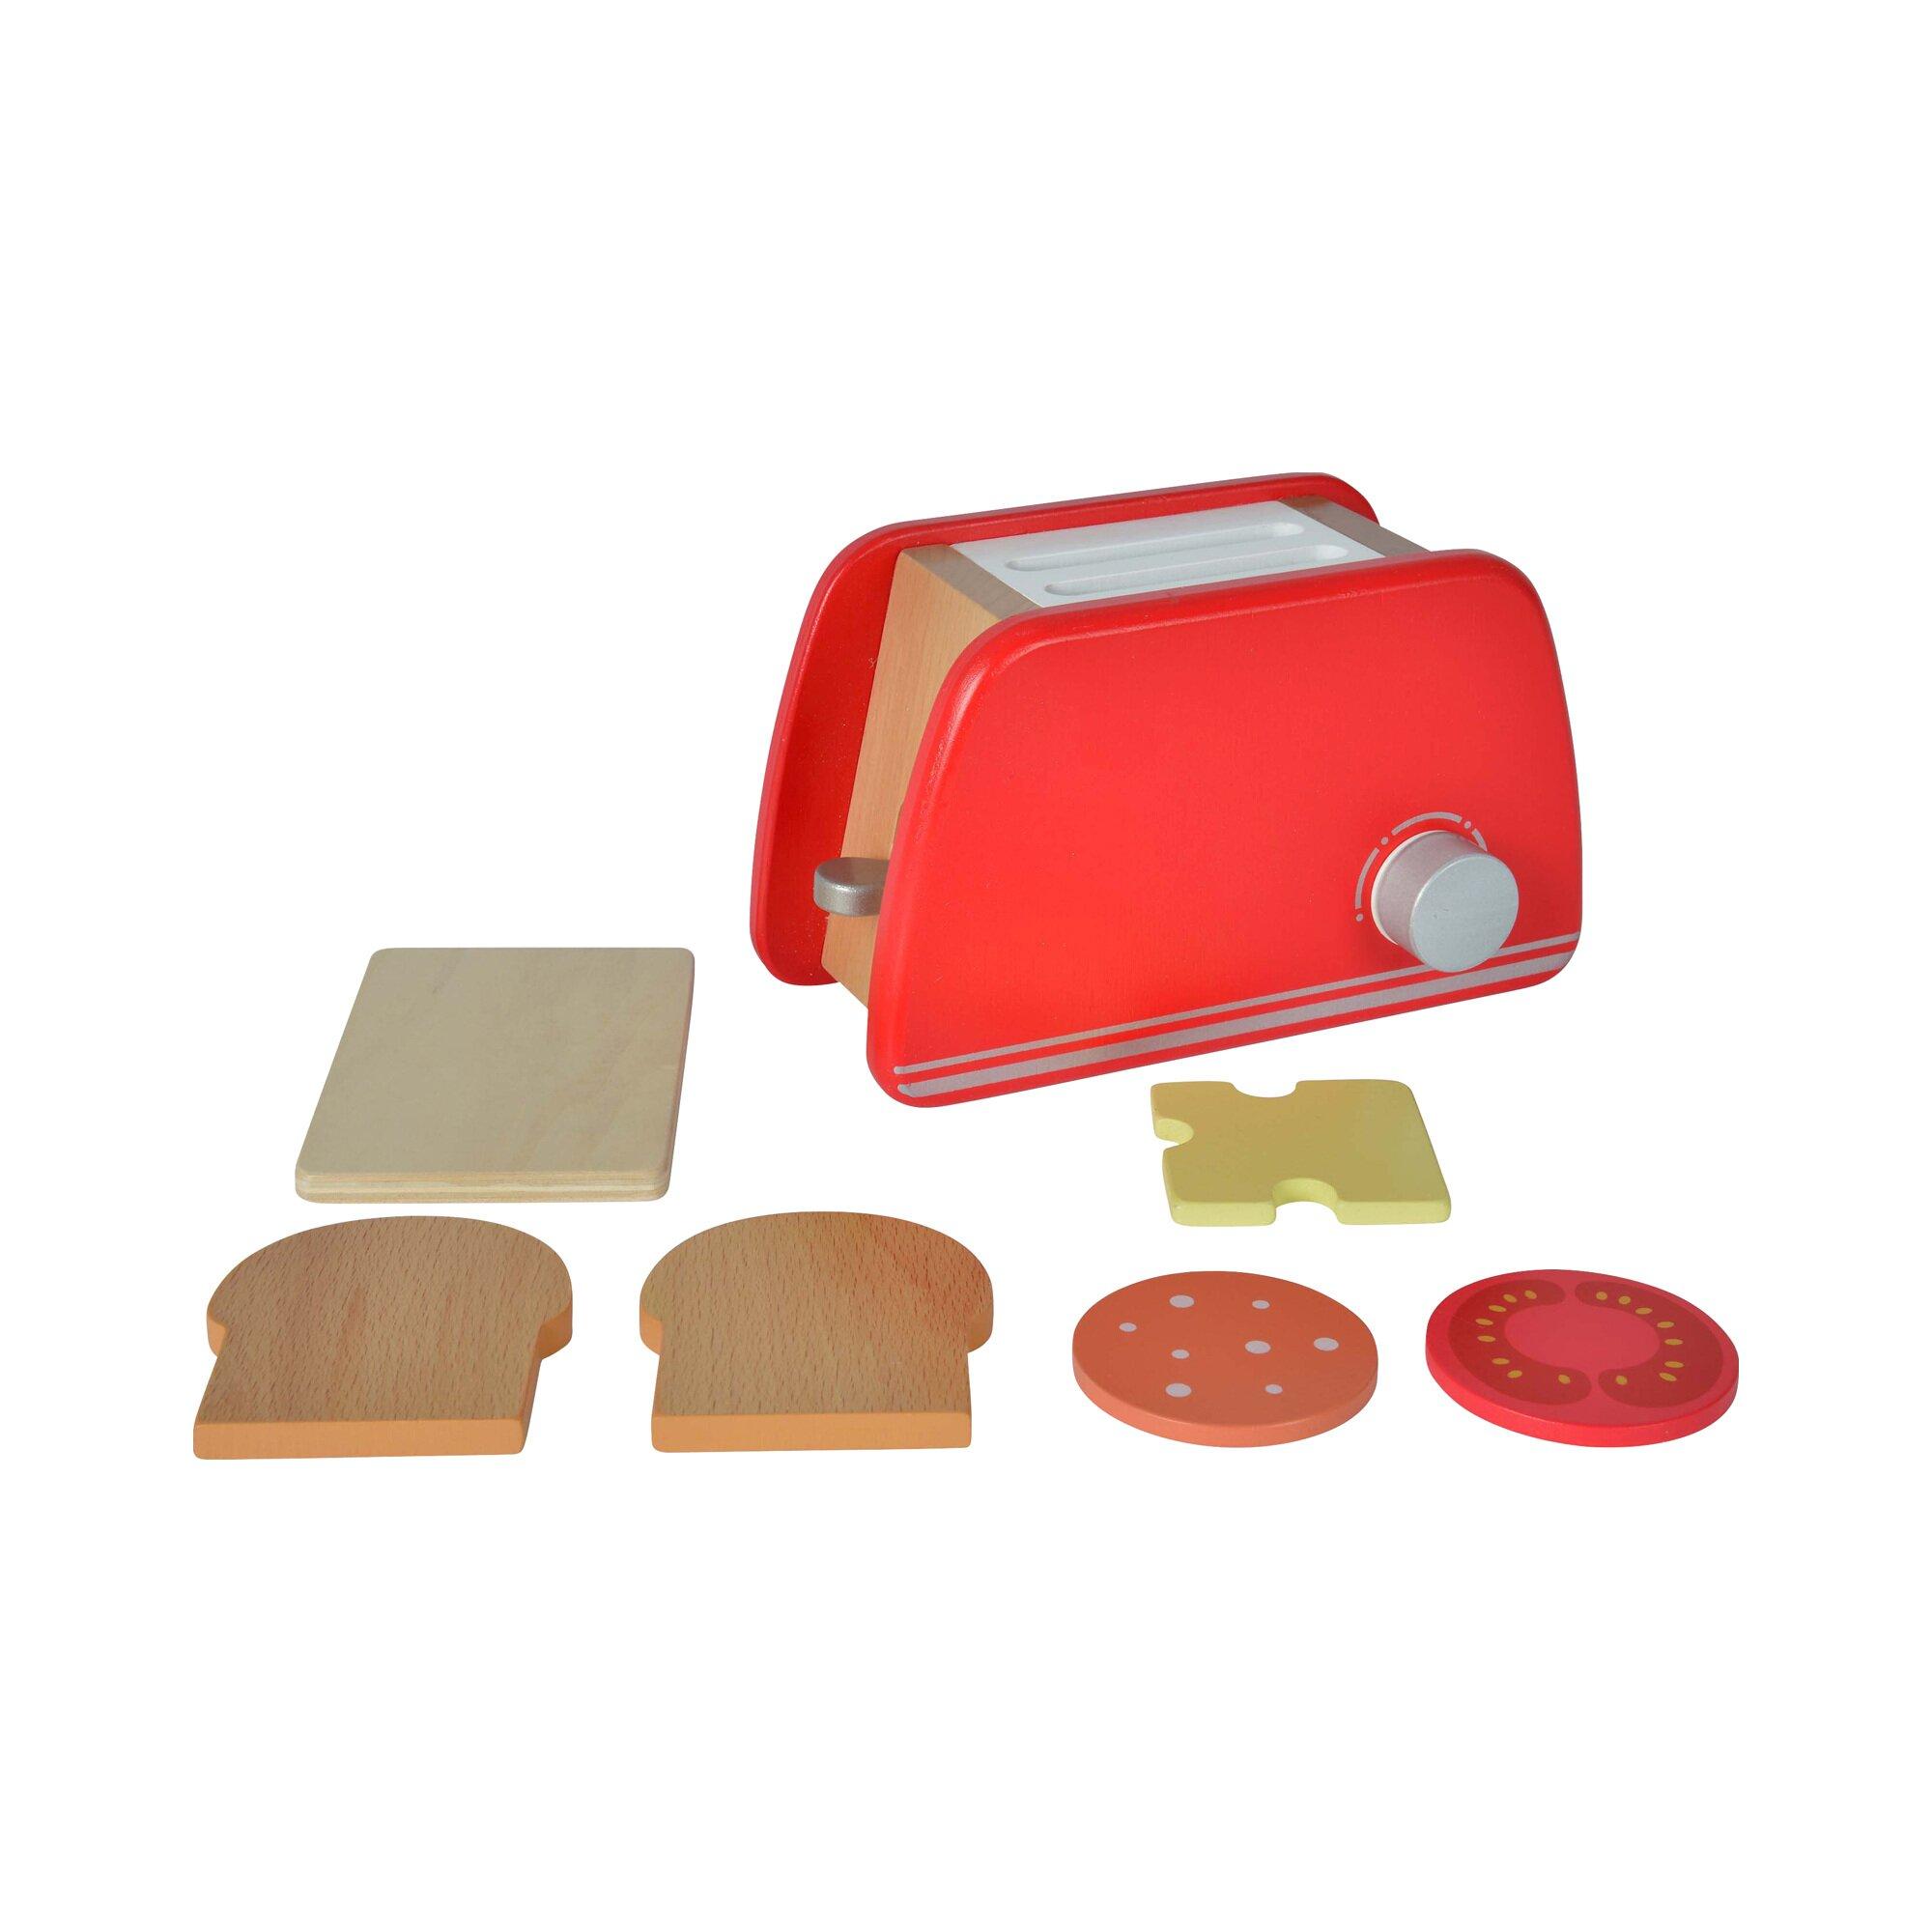 eichhorn-toaster-aus-holz